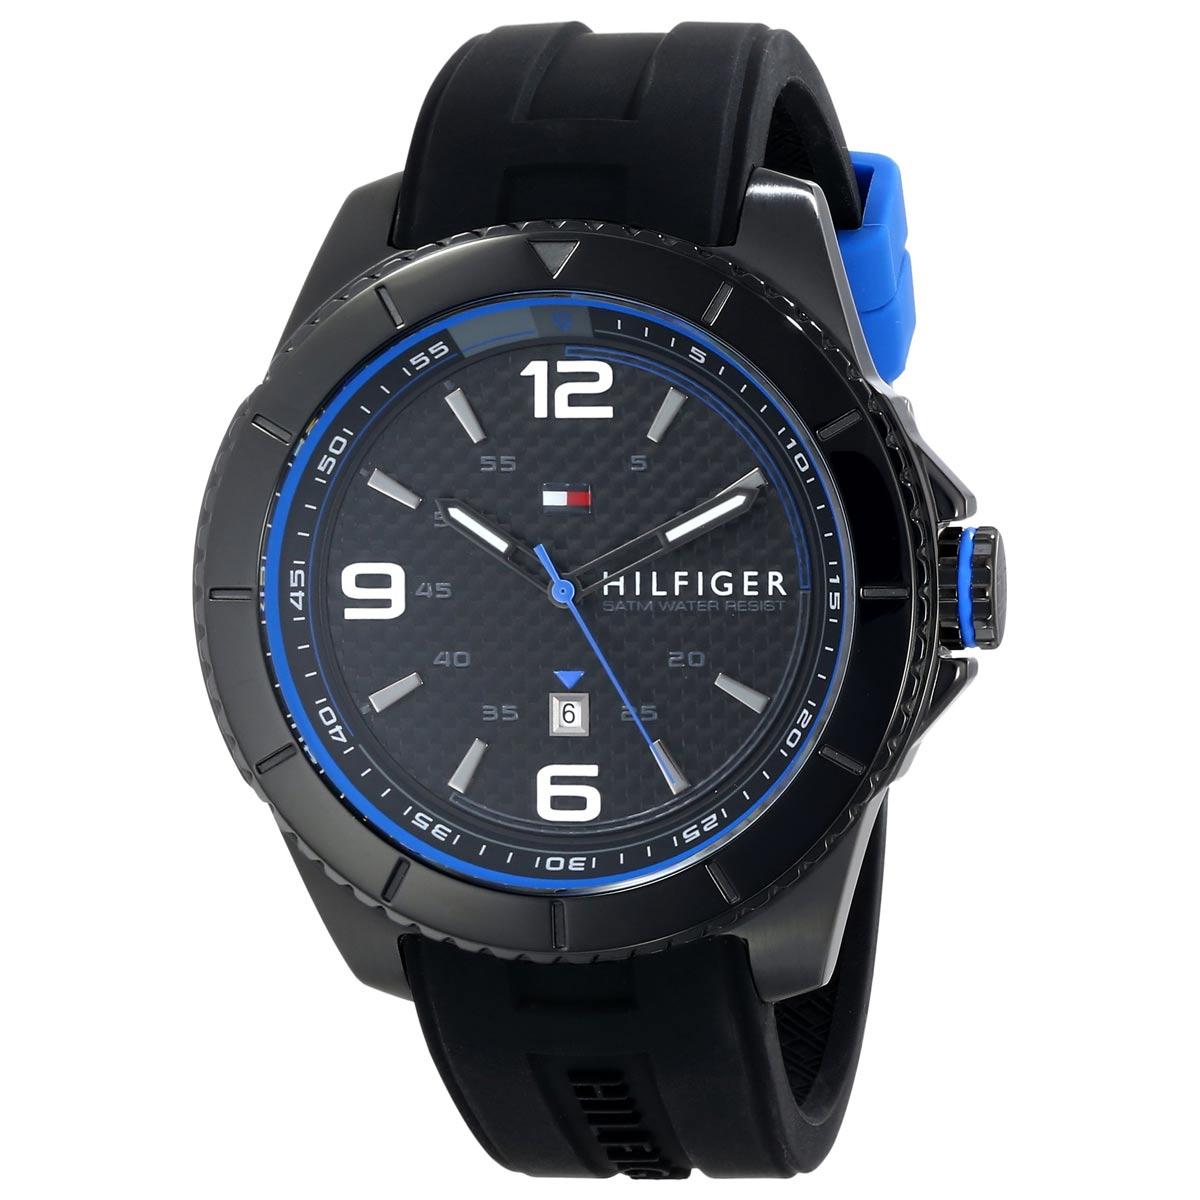 Amazon: Tommy Hilfiger 1791017 Reloj analógico, envío Gratis $869